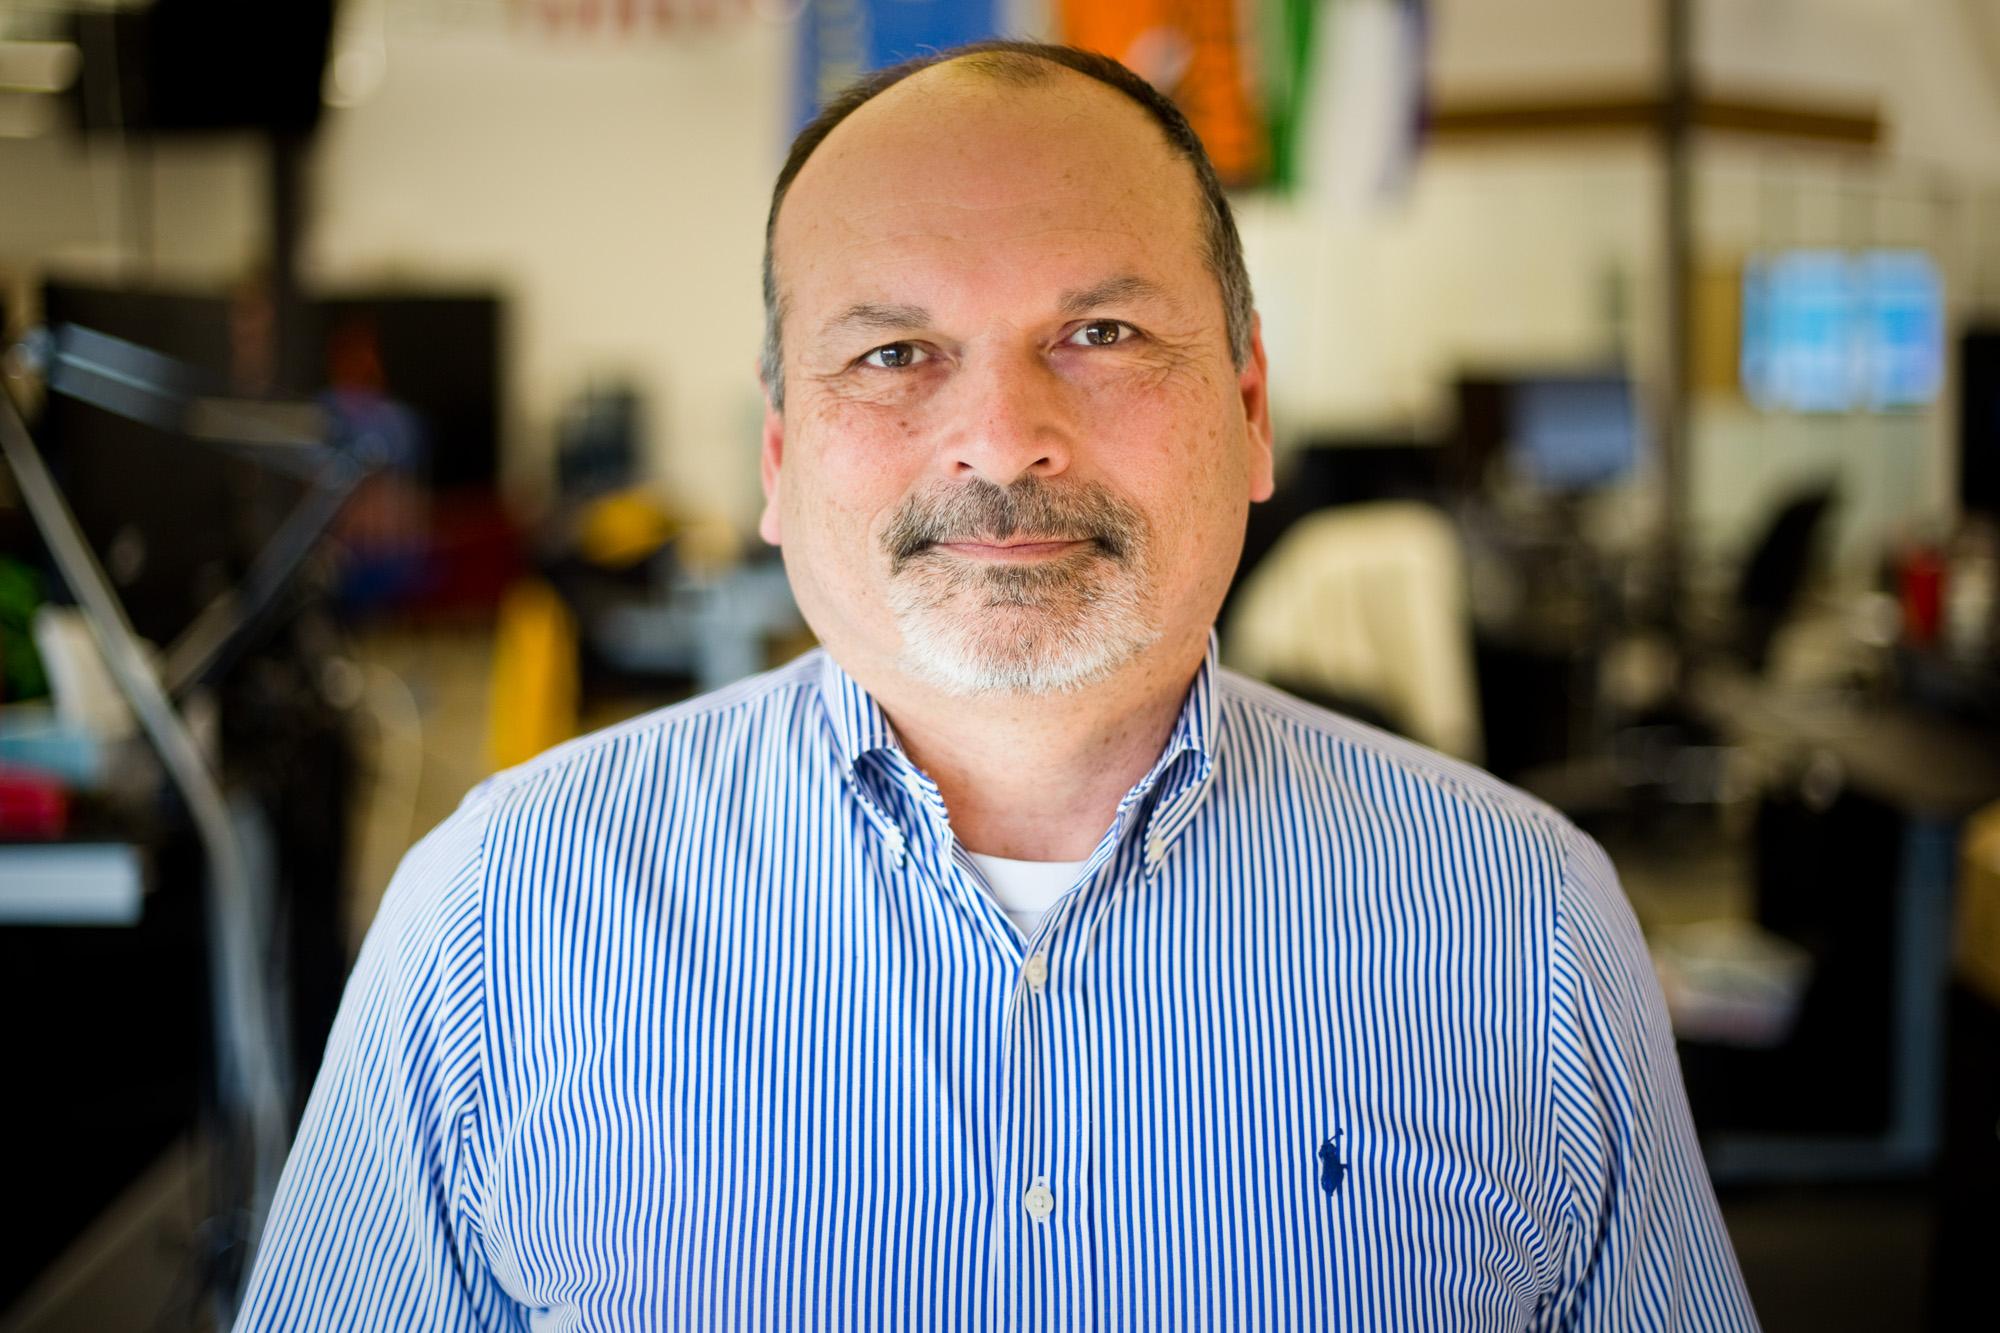 Preston Callicott, 61, at his office at Five Talent